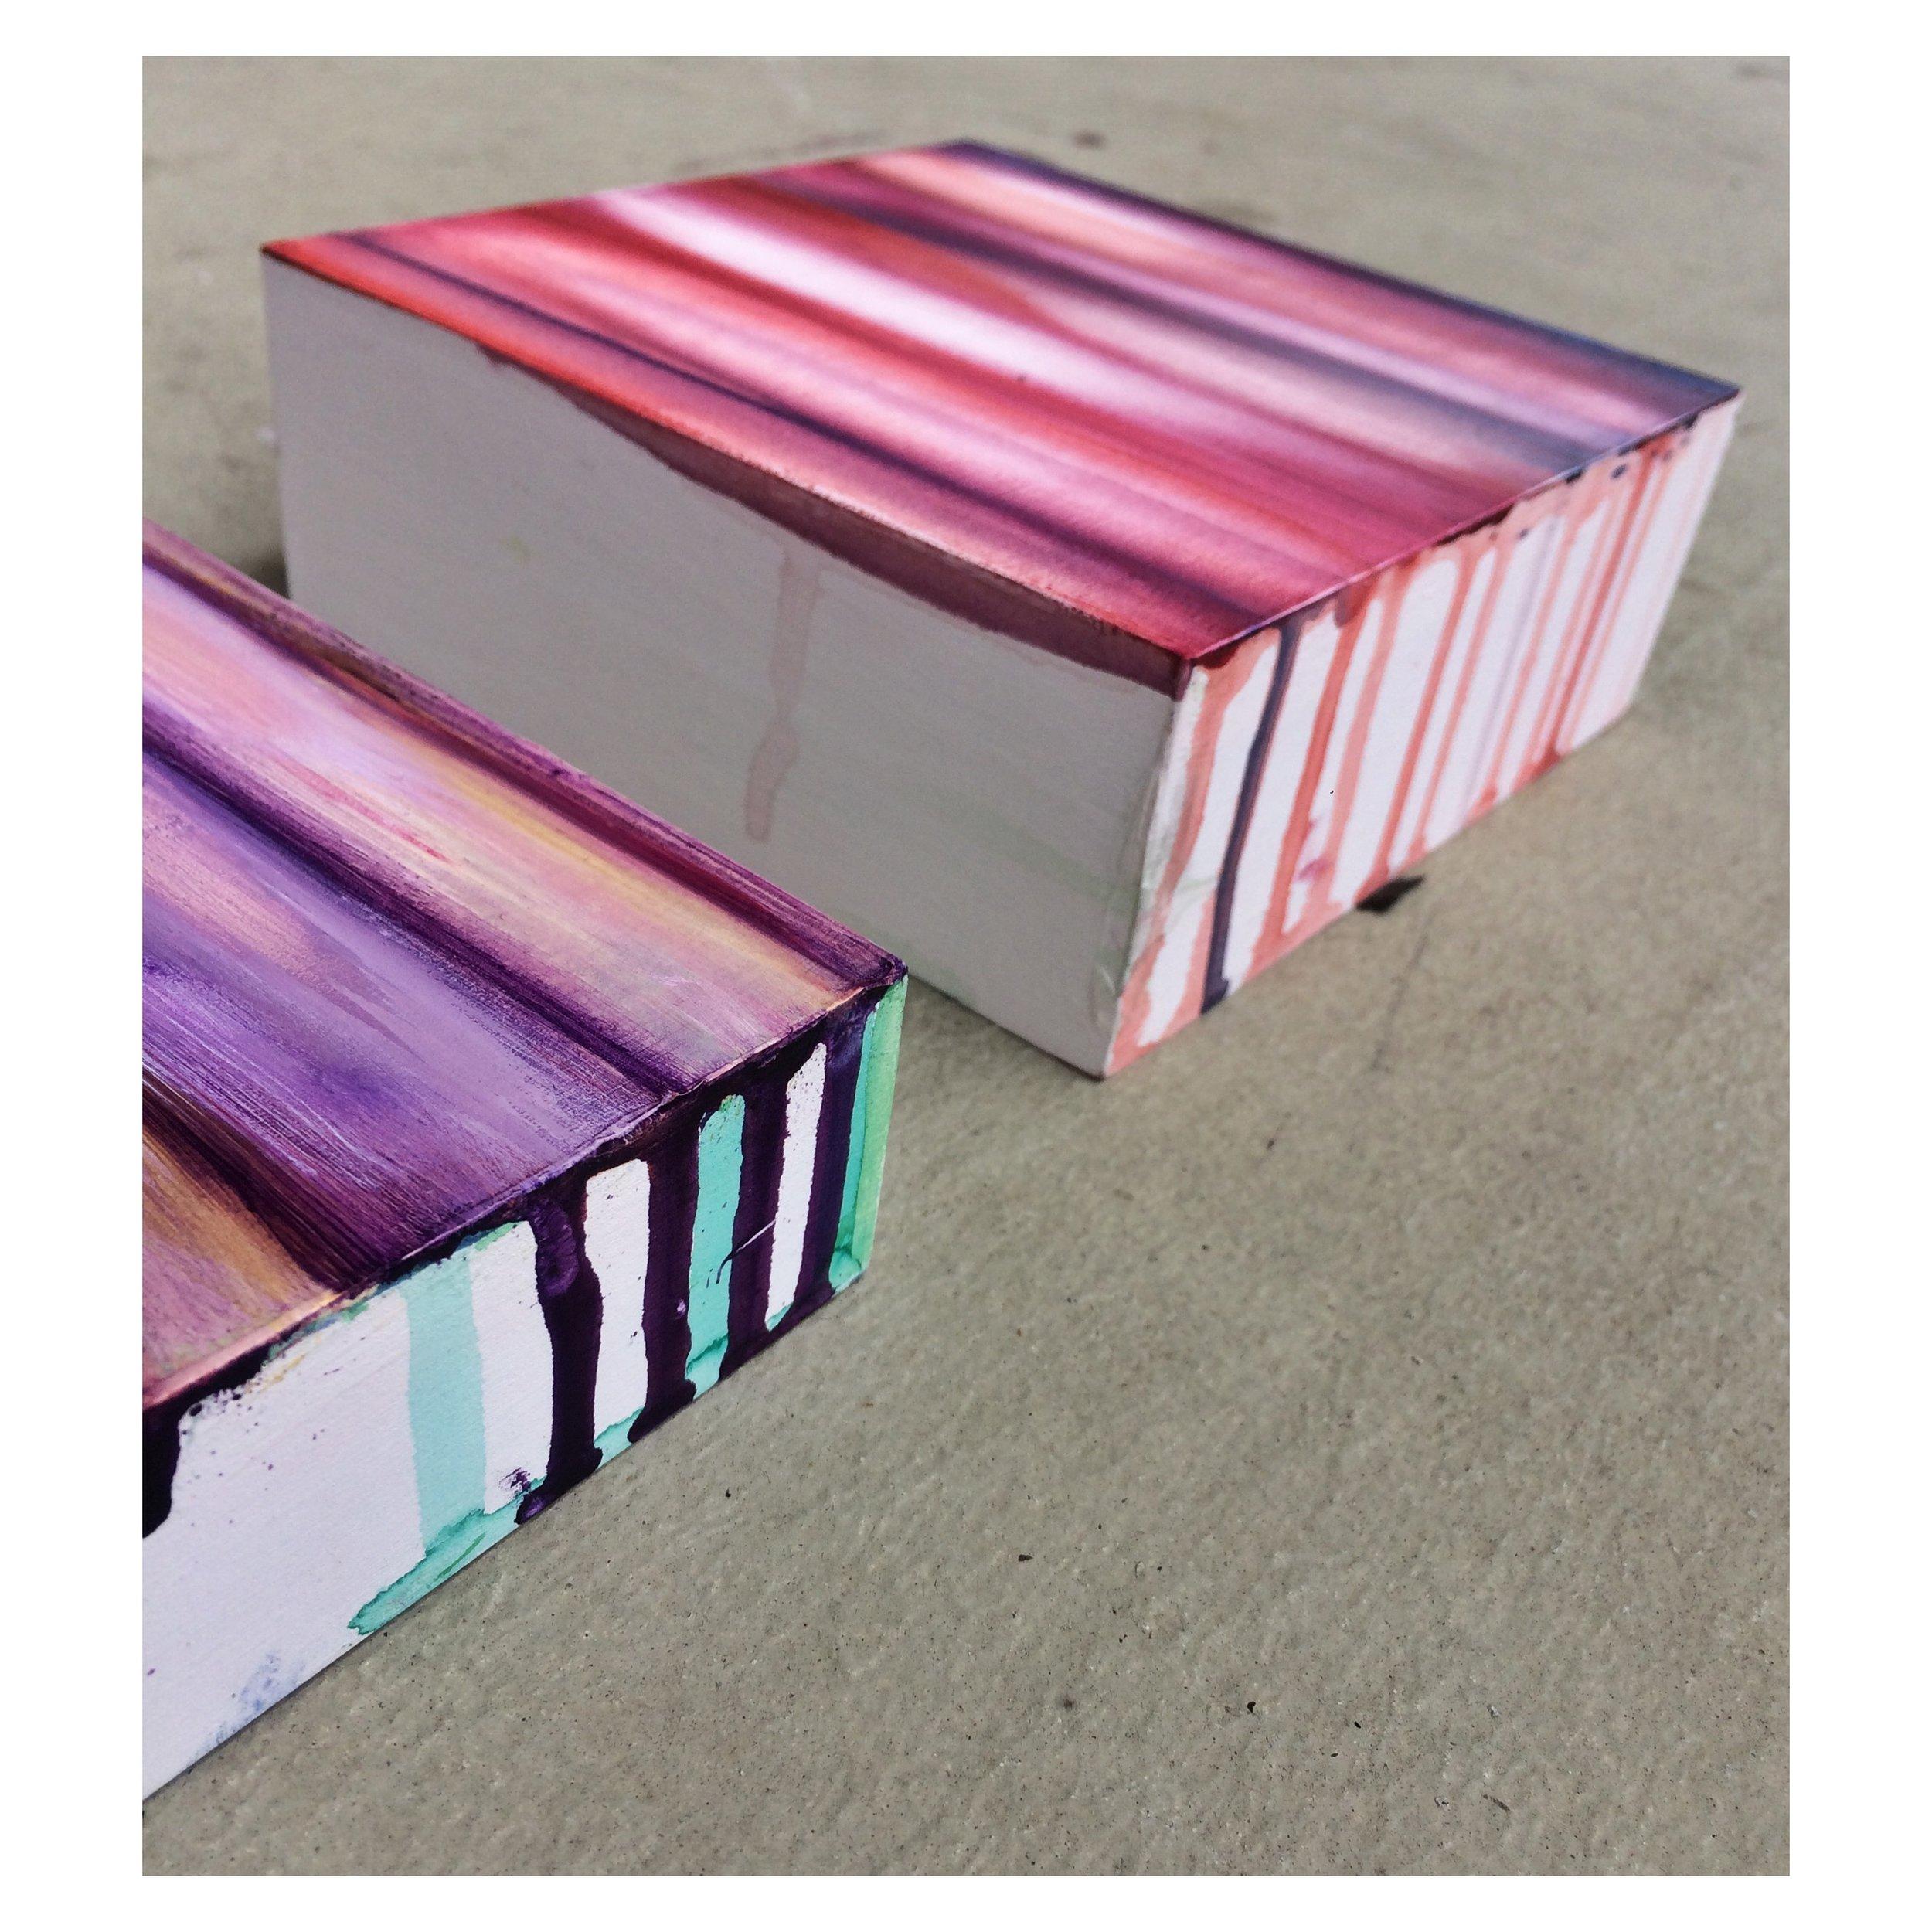 "Transparency (detail), 2018, Set of 3, Wood panel, watercolor paint, acrylic paint, 6x6"""